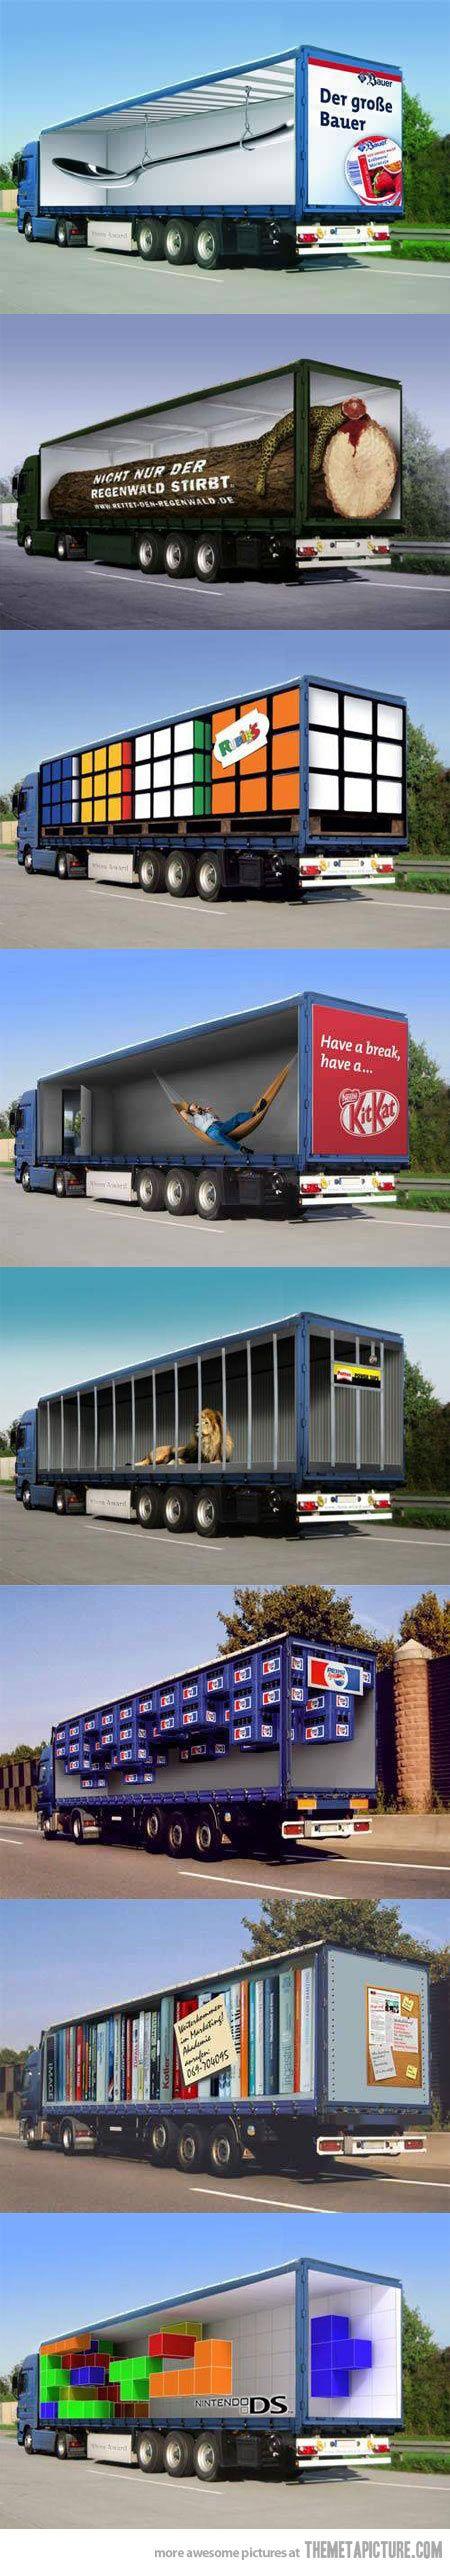 Original truck advertisements…